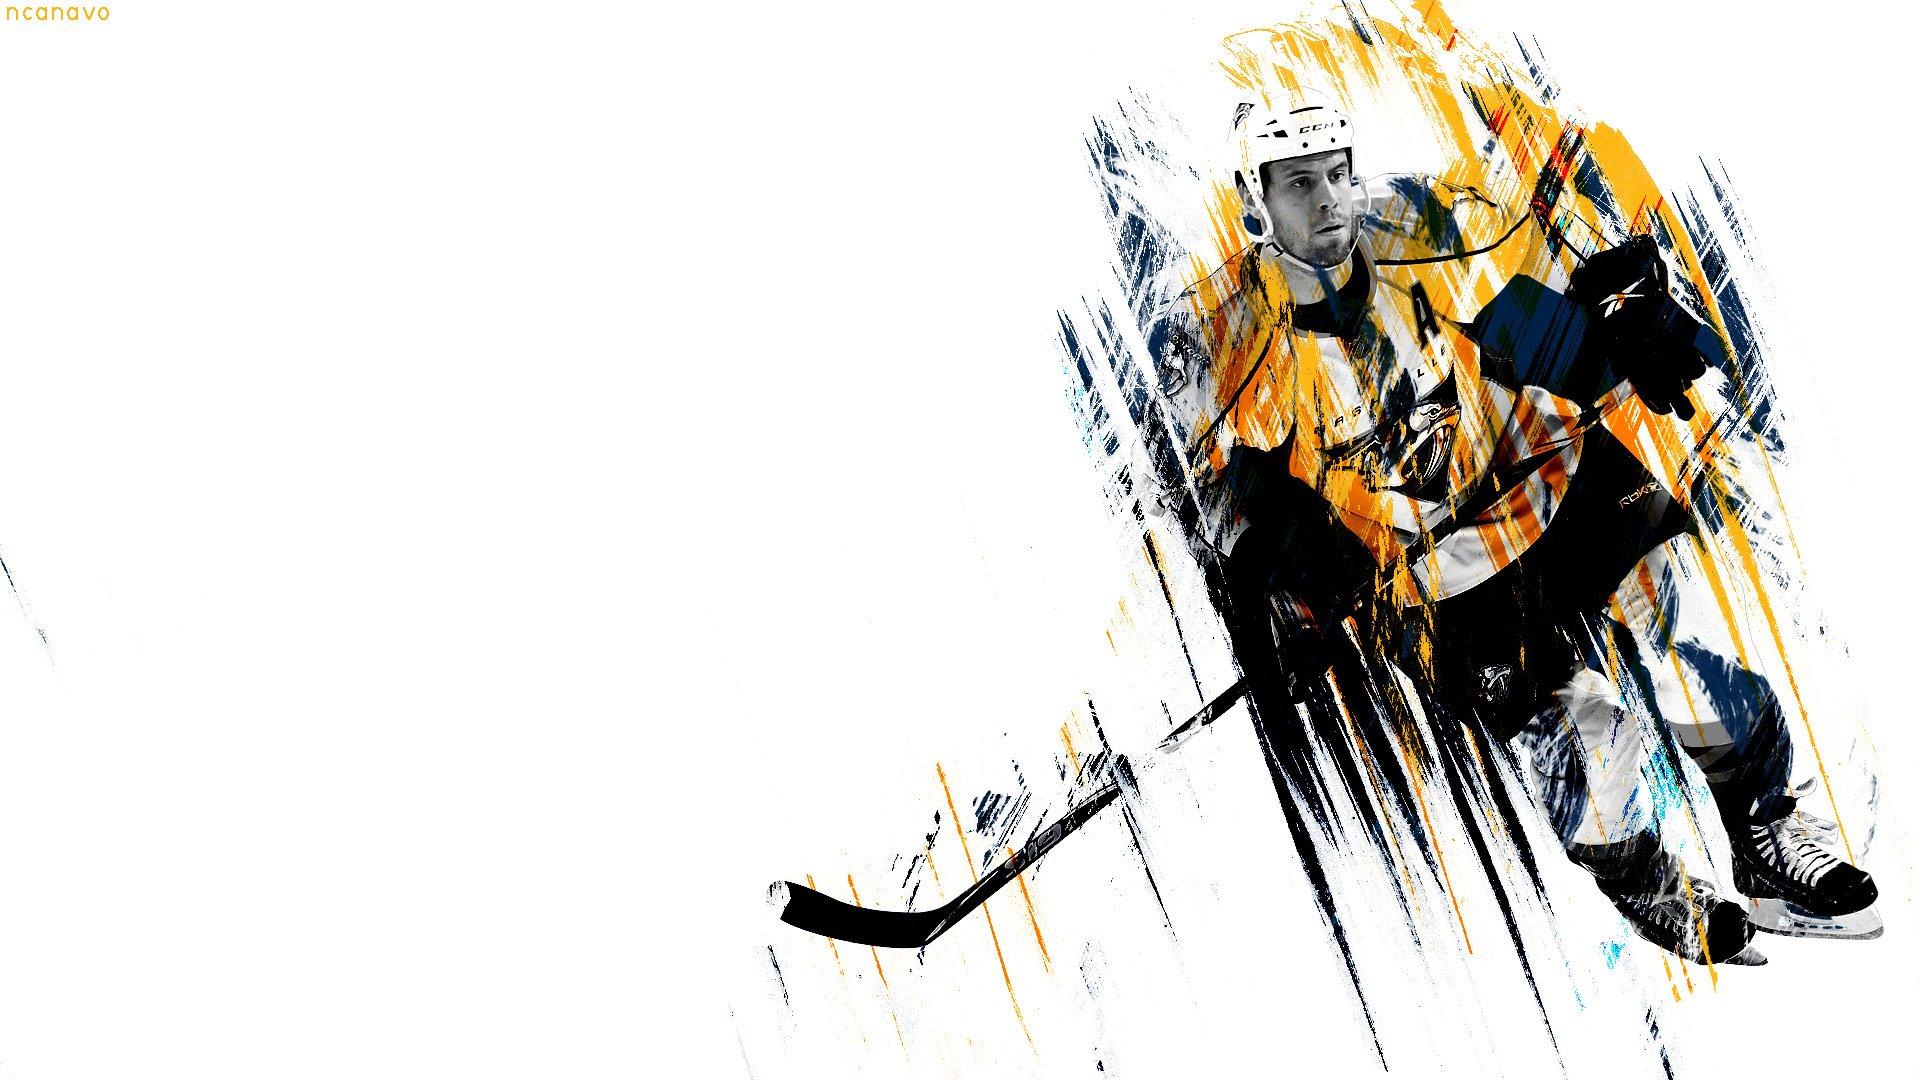 NASHVILLE PREDATORS Nhl Hockey 53 Wallpaper